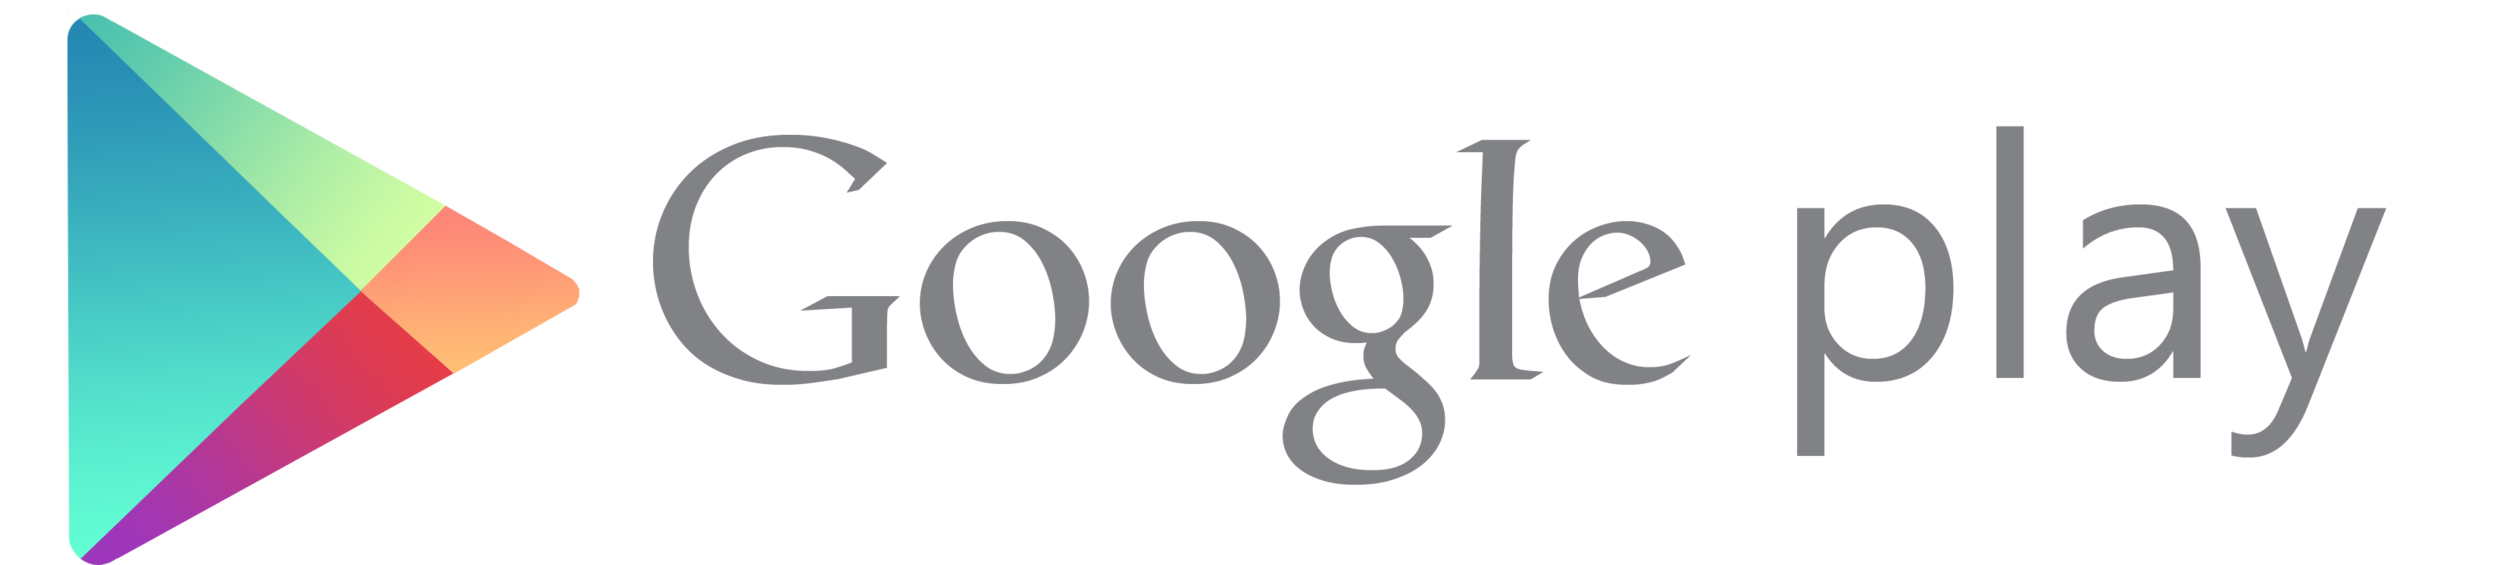 google_play_logo_by_silviu_eduard-d4s7k51.png